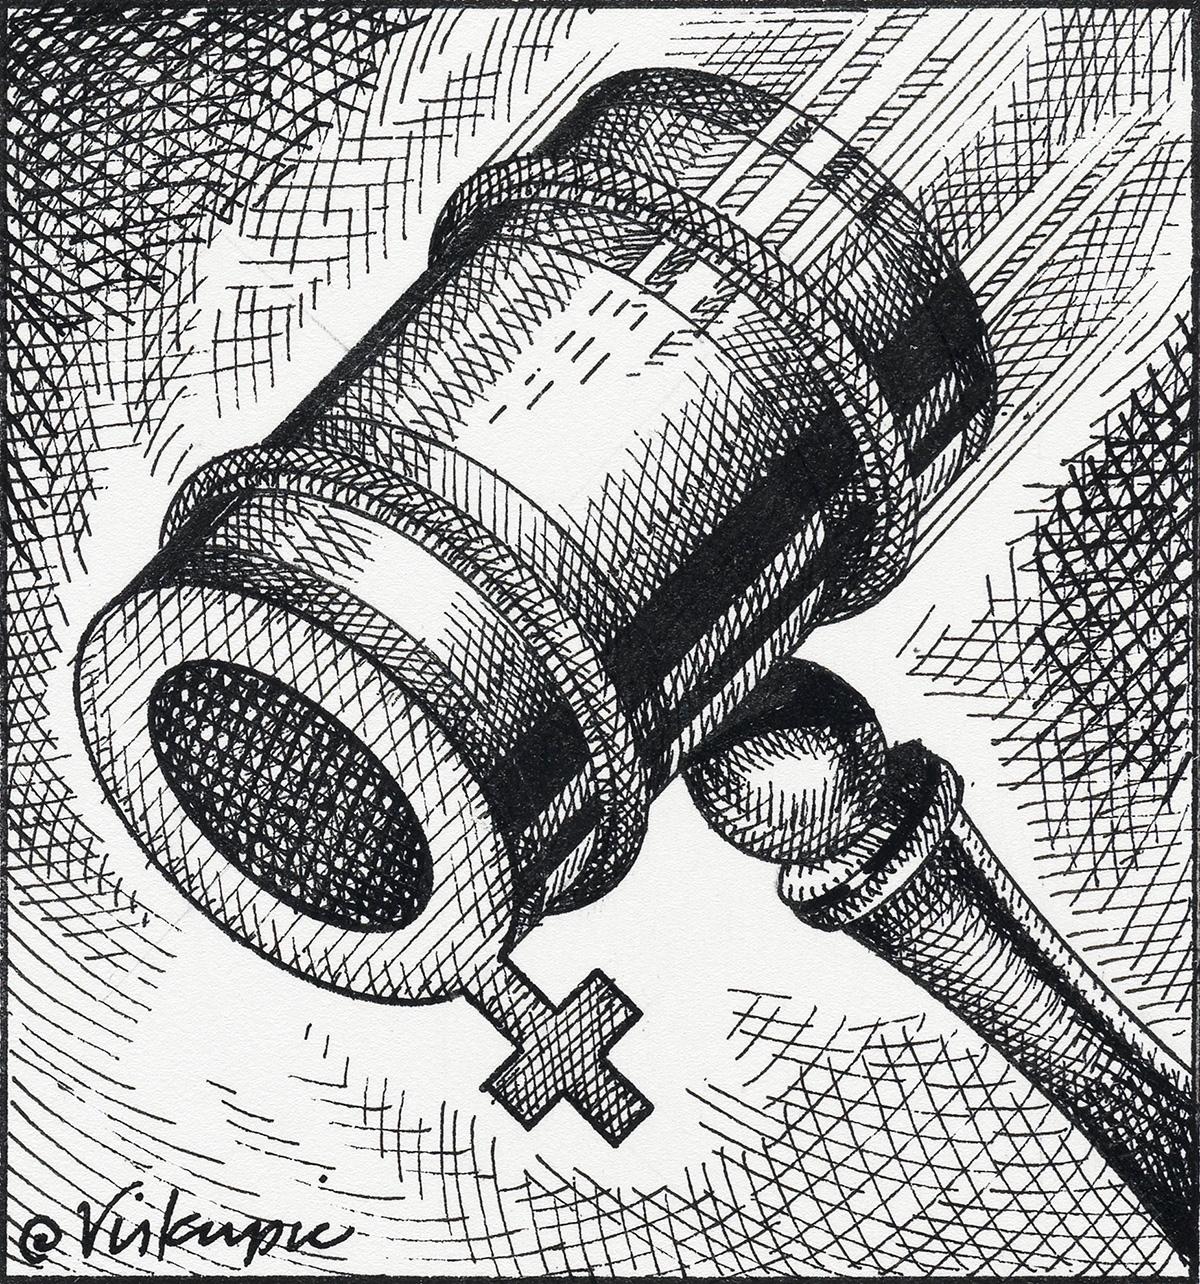 GARY-VISKUPIC-(CARTOON)-Womens-Rights-under-the-Gavel